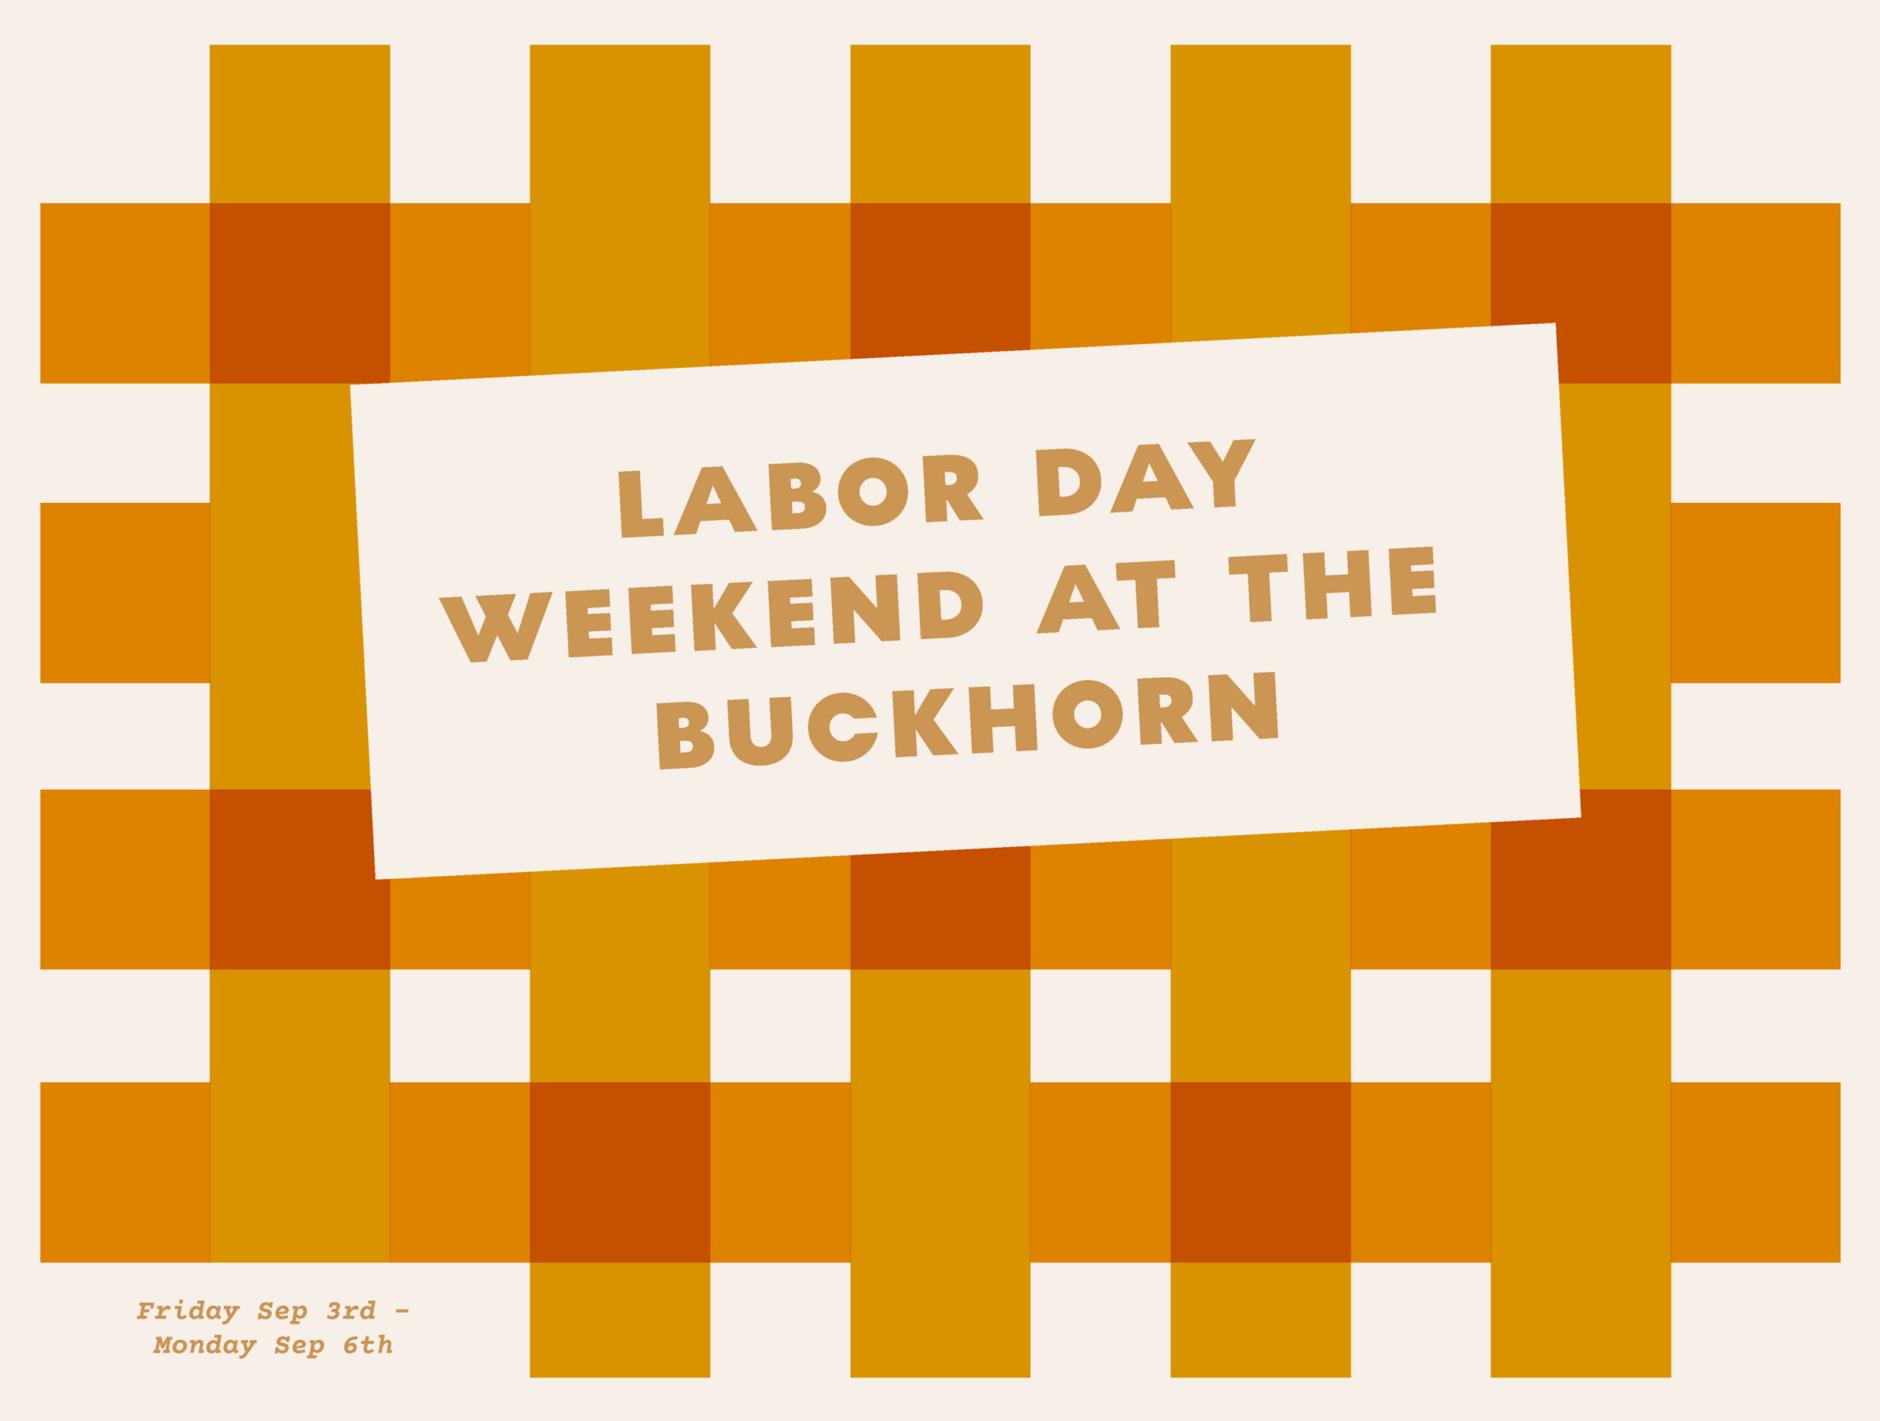 Labor Day Weekend at The Buckhorn, Cuyama Buckhorn